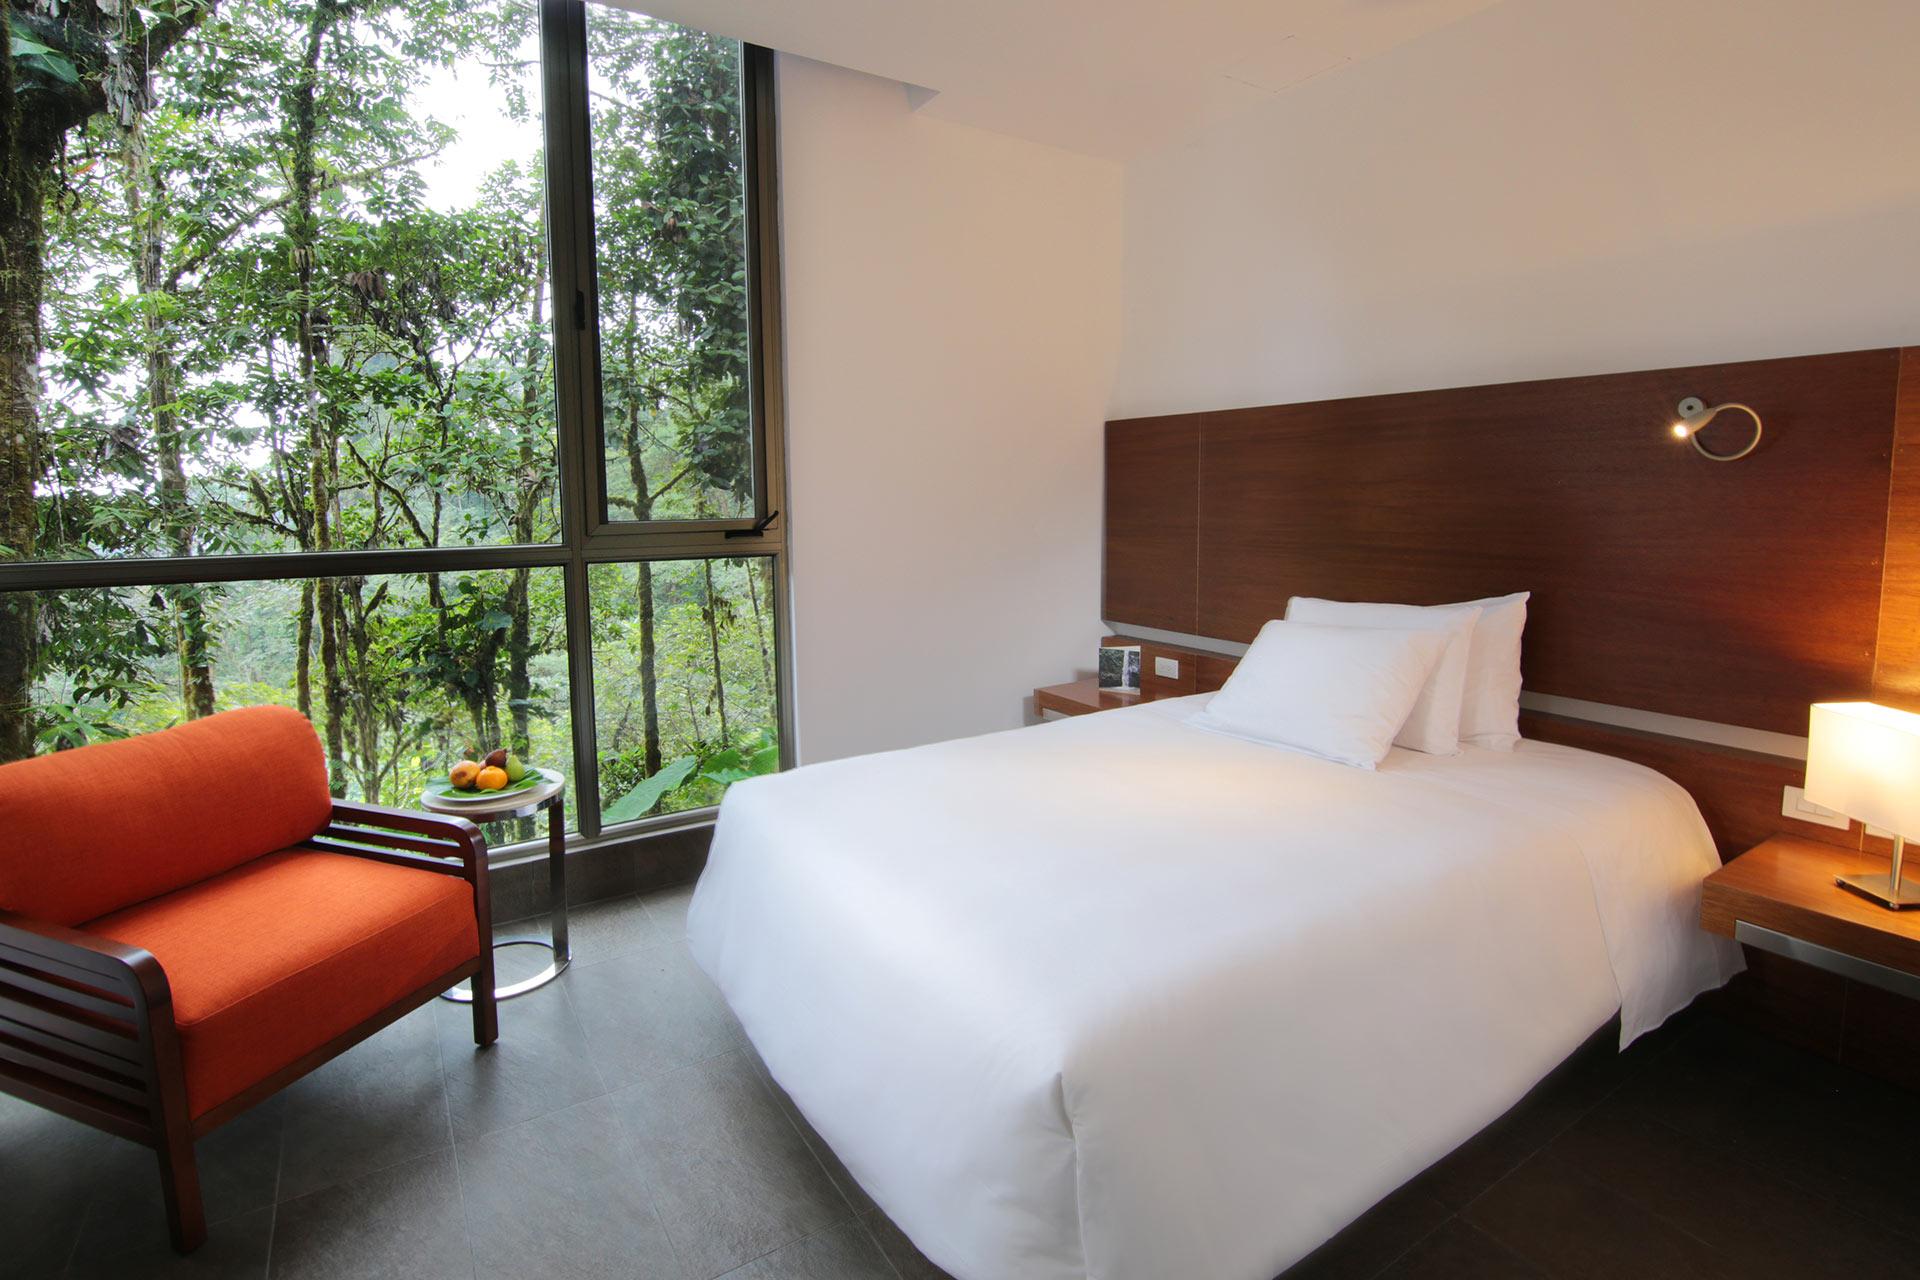 Wawa Room at Mashpi Lodge in Ecuador's Cloud forest